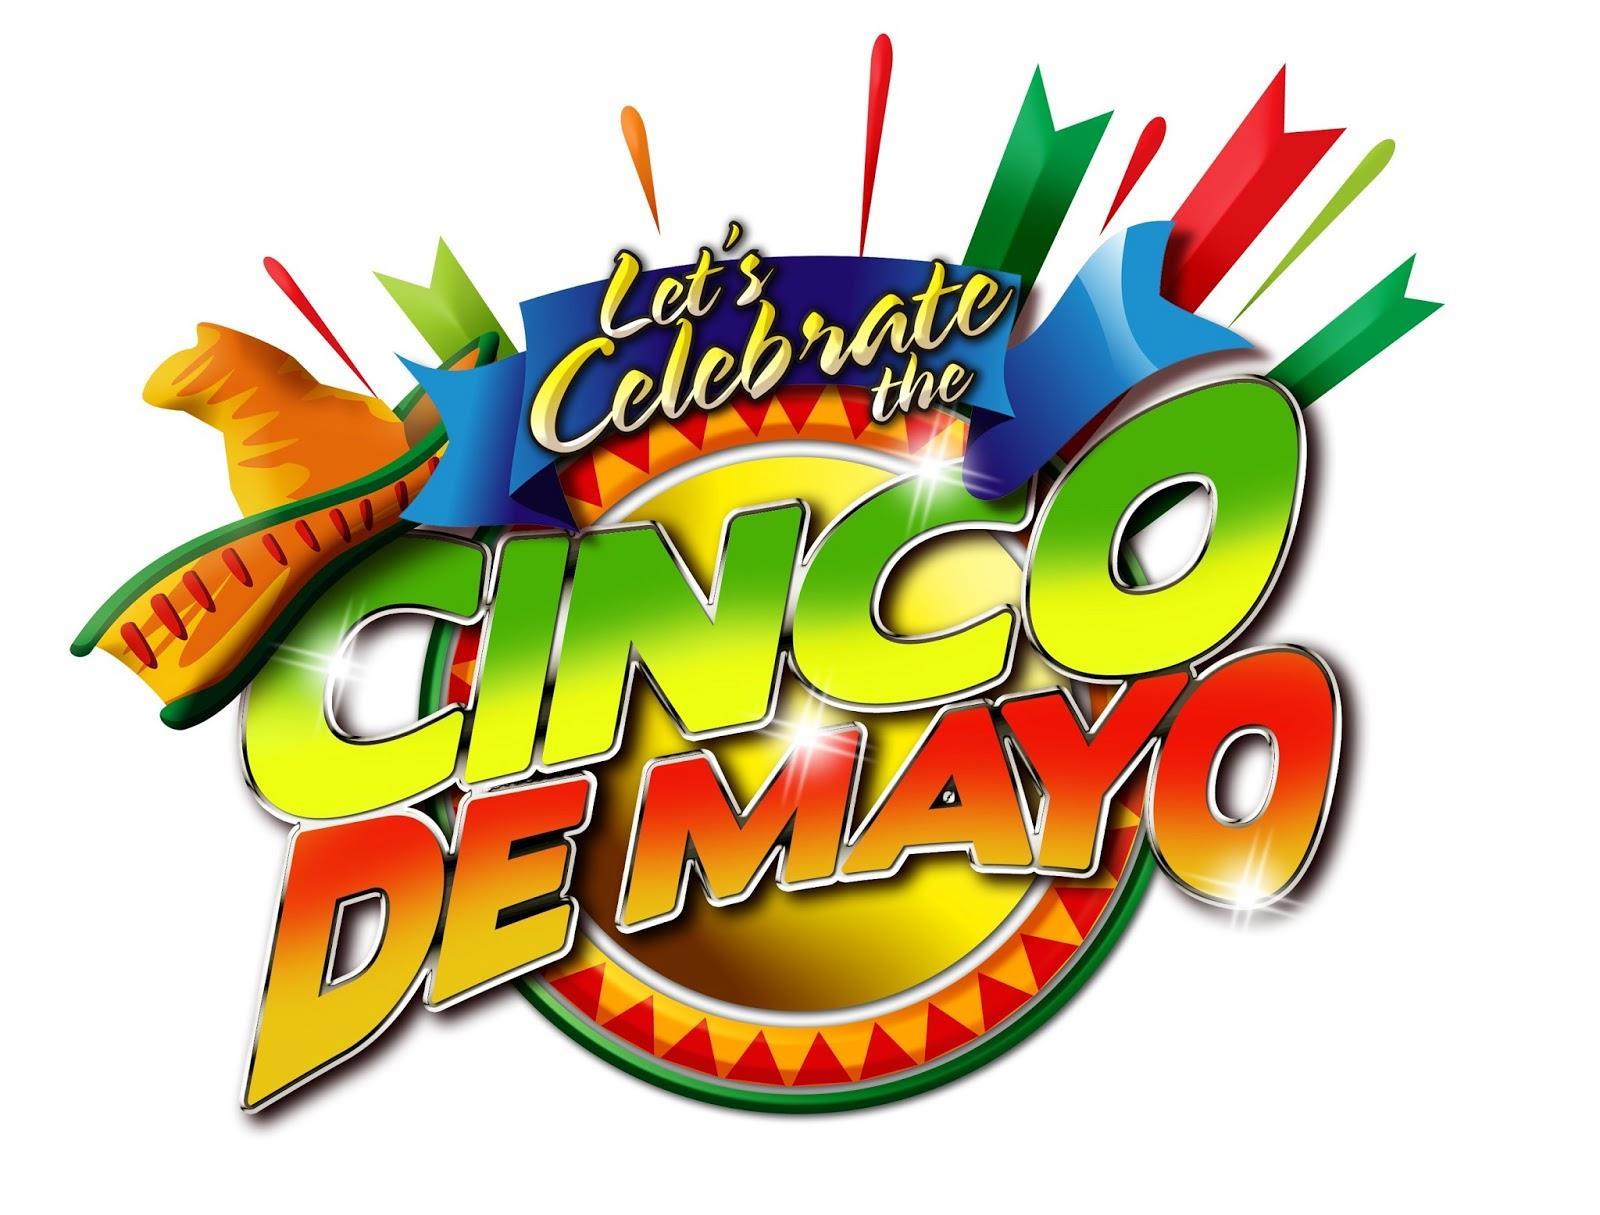 Cinco de mayo celebration. Celebrate clipart social event